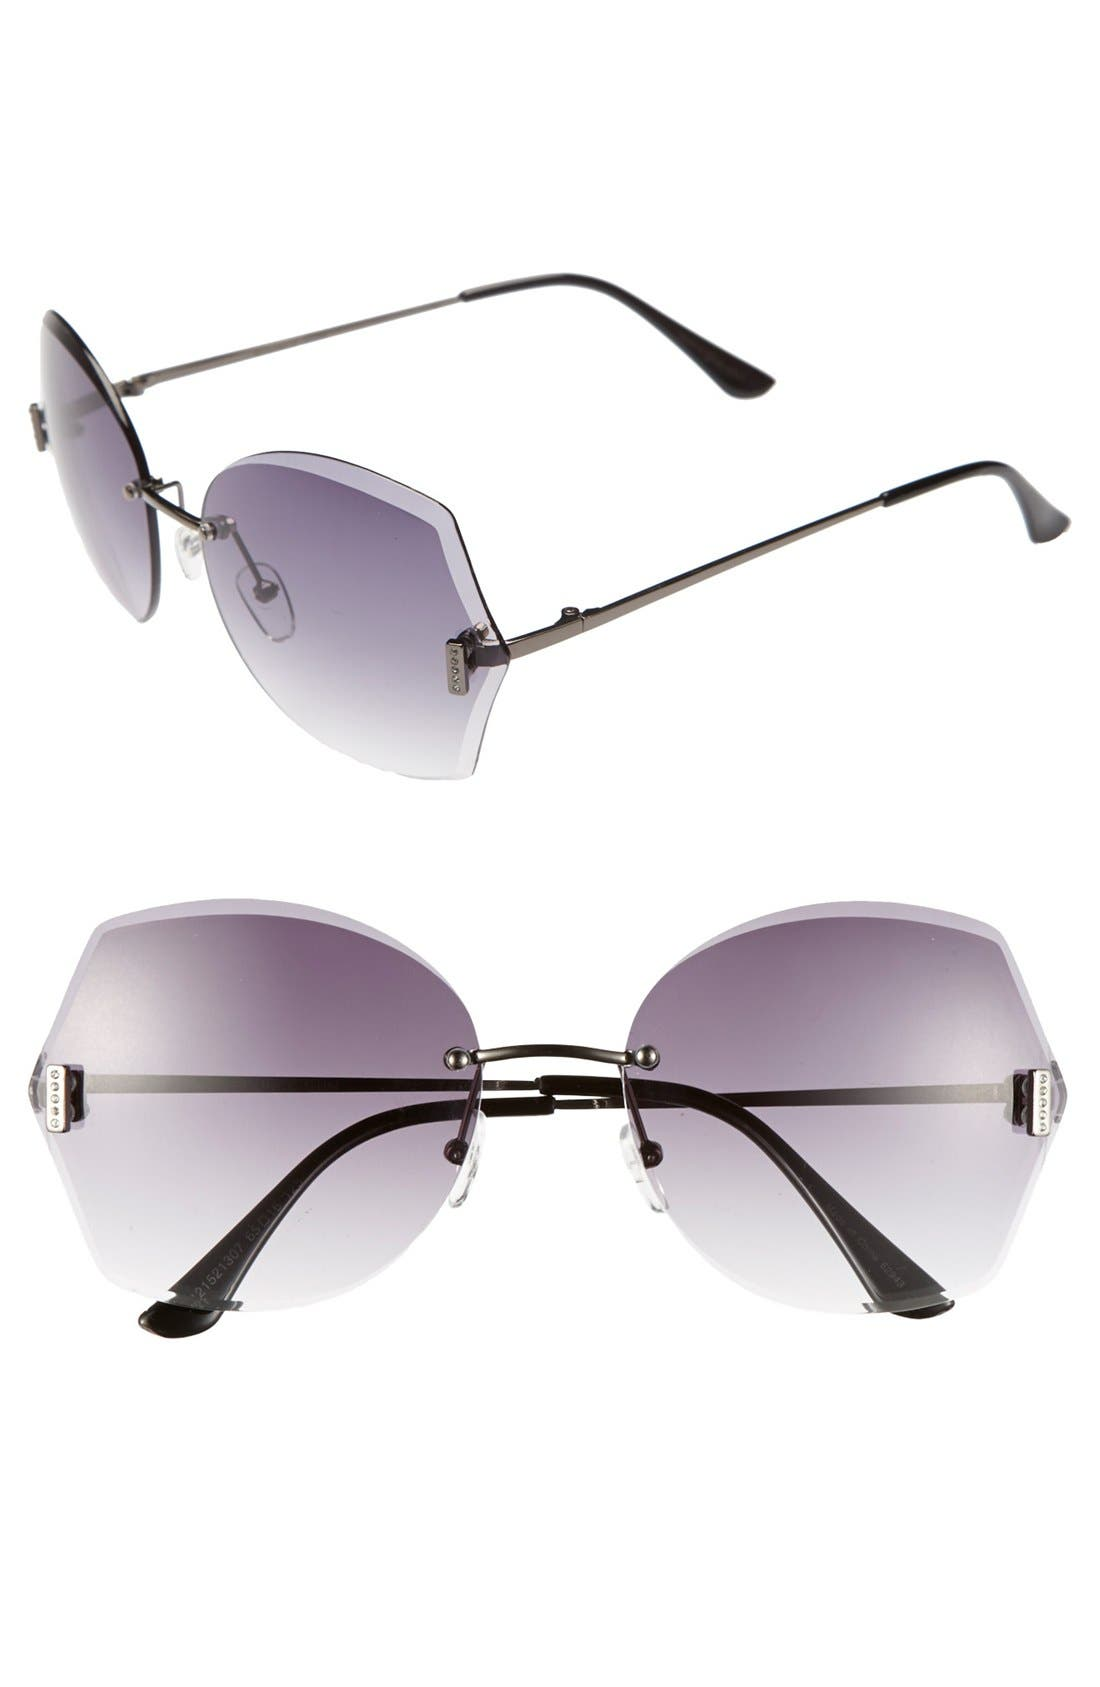 Alternate Image 1 Selected - Outlook Eyewear 'Bounce' 65mm Sunglasses